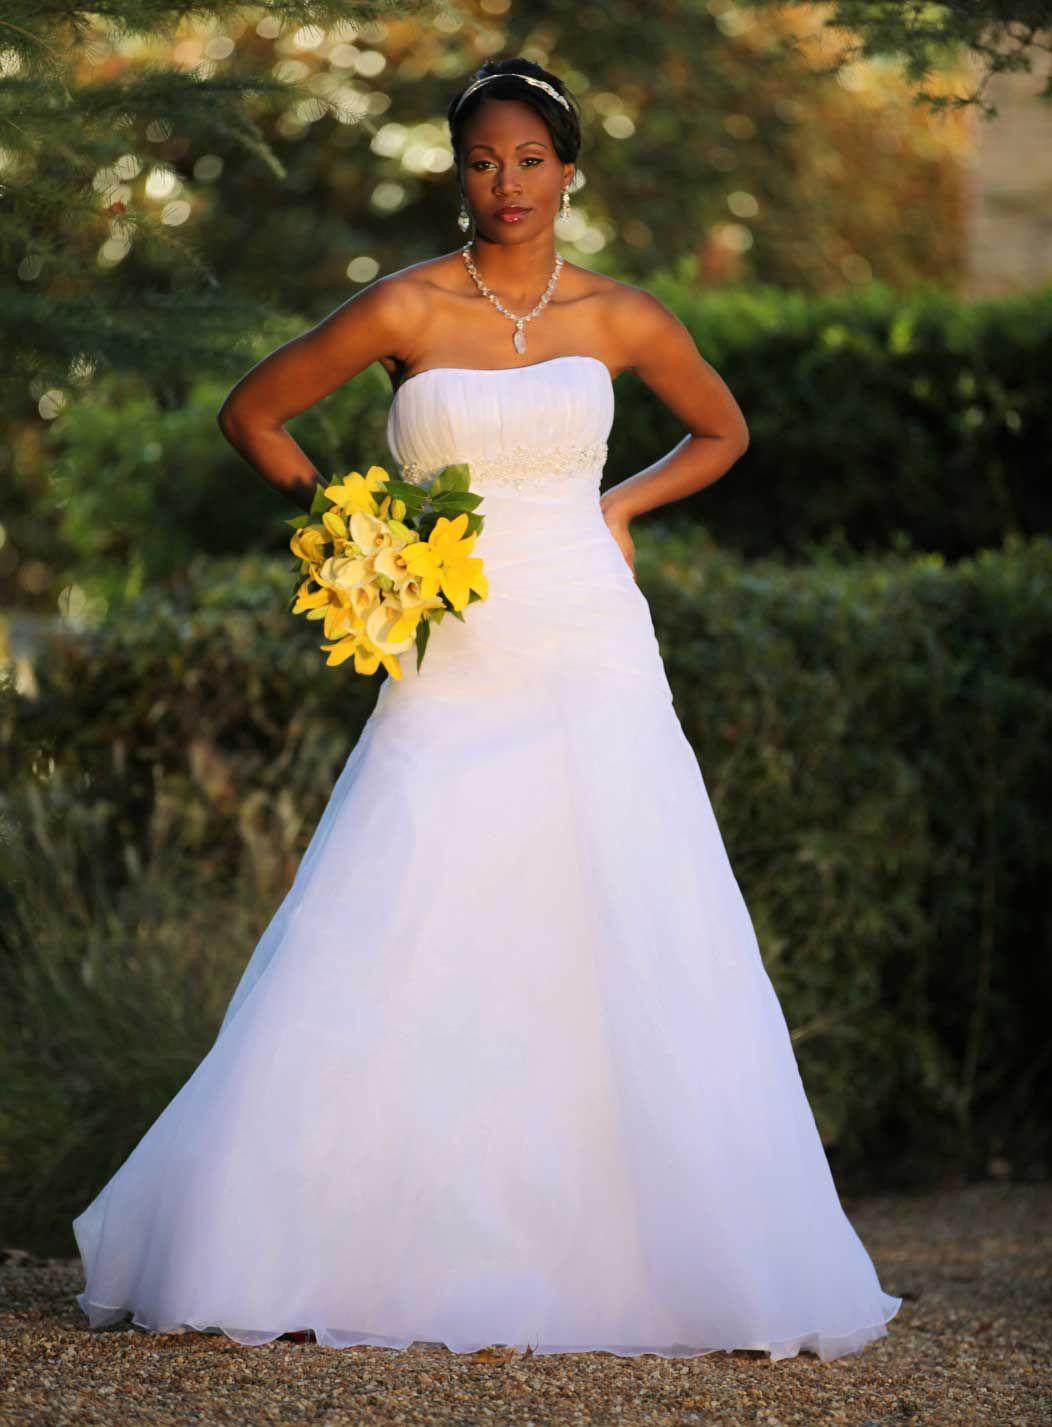 Anya - Bella | Wedding Dresses | Pinterest | Bridal dresses, Wedding ...